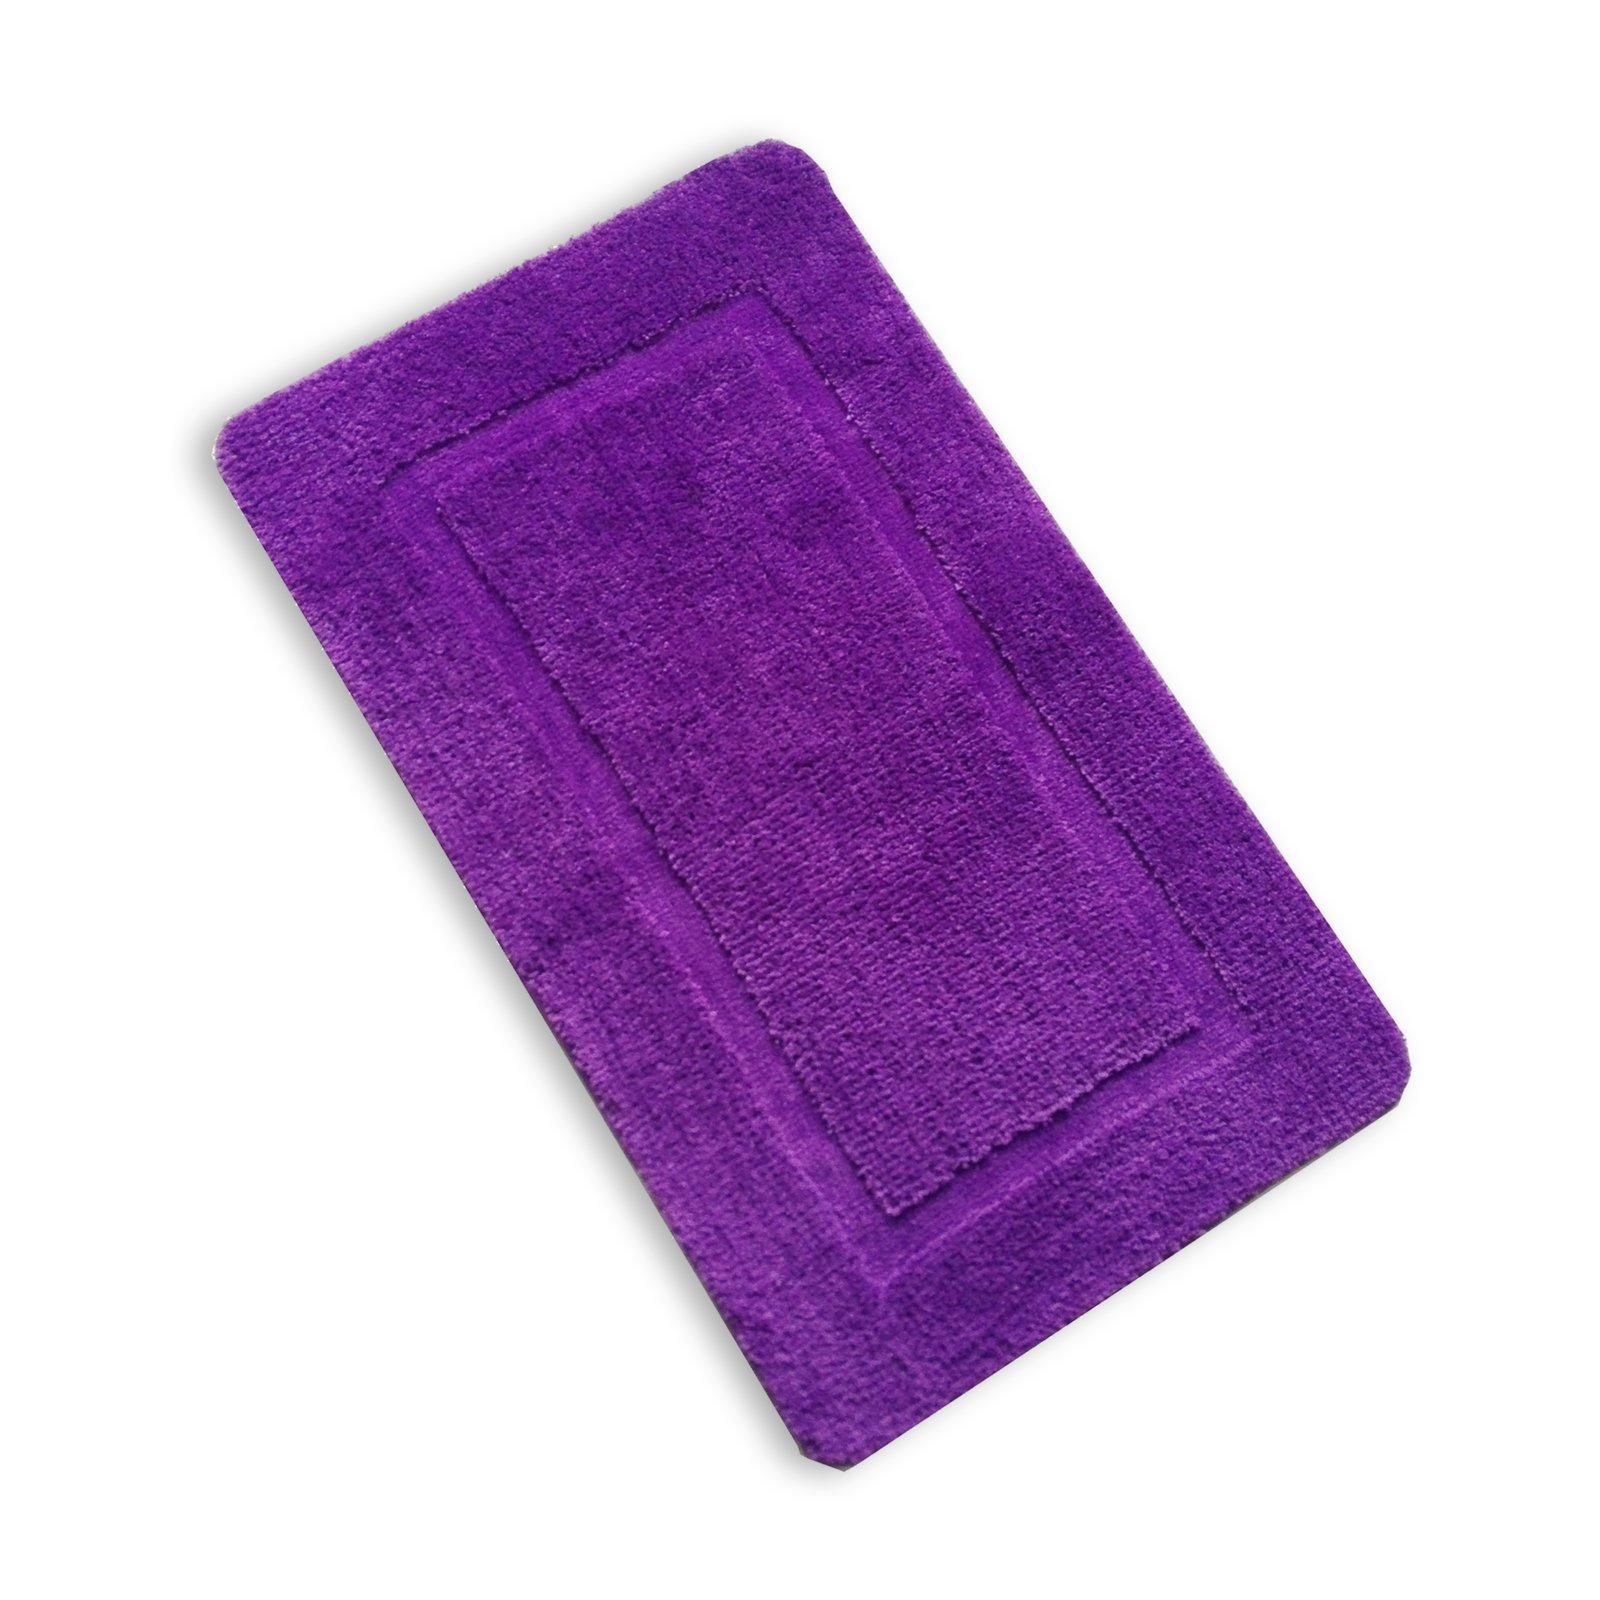 badteppich lilac lila 60x100 cm badteppiche matten. Black Bedroom Furniture Sets. Home Design Ideas